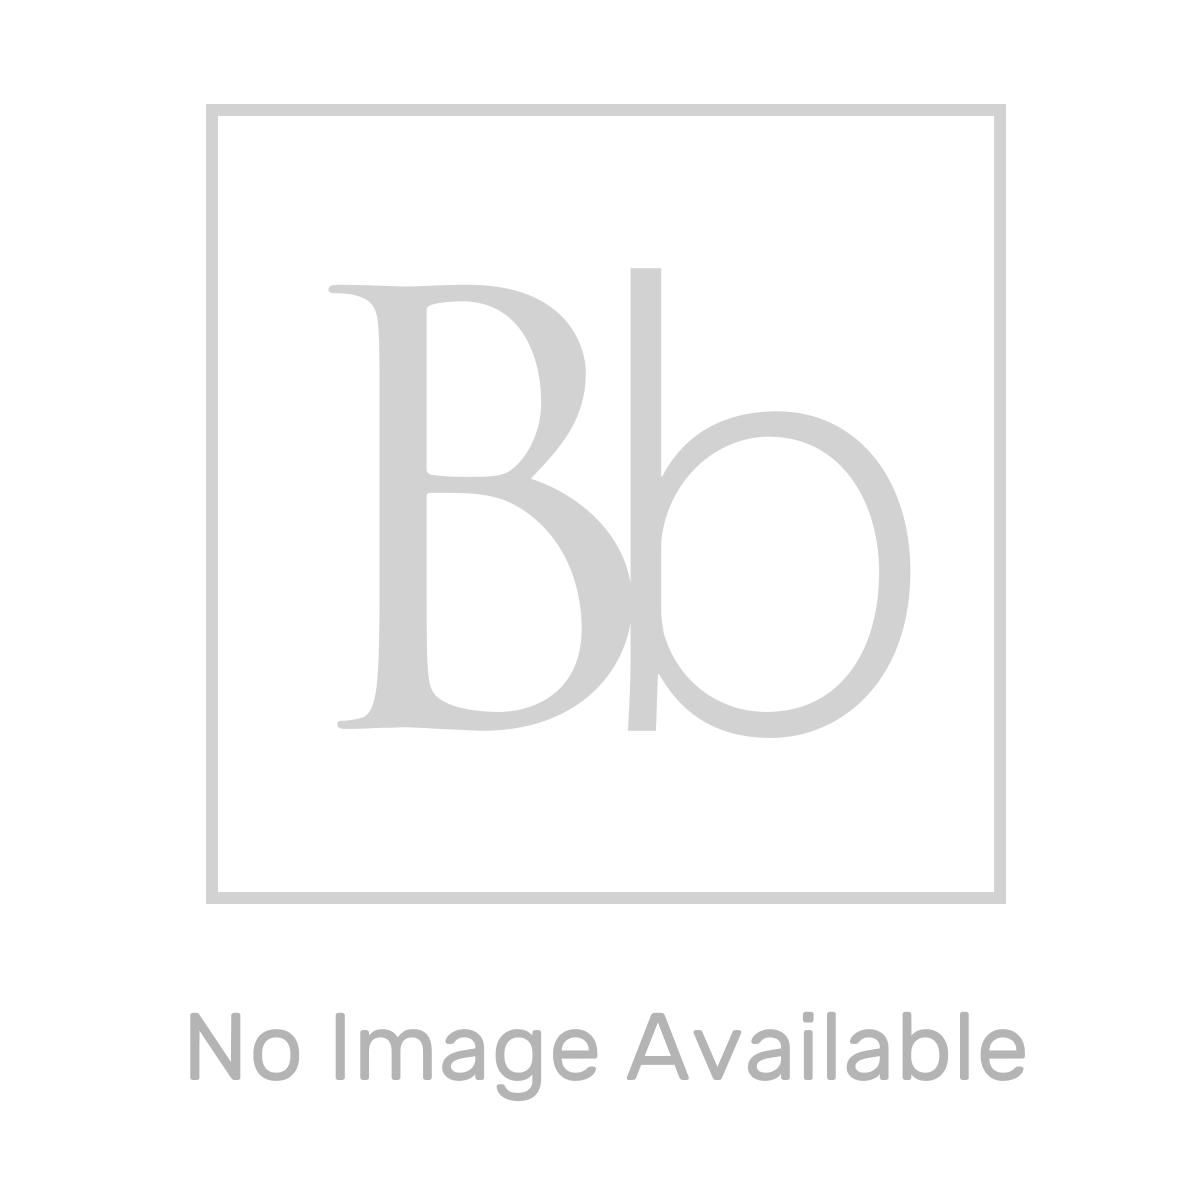 Aquadart Rectangular 1700 x 900 Shower Tray